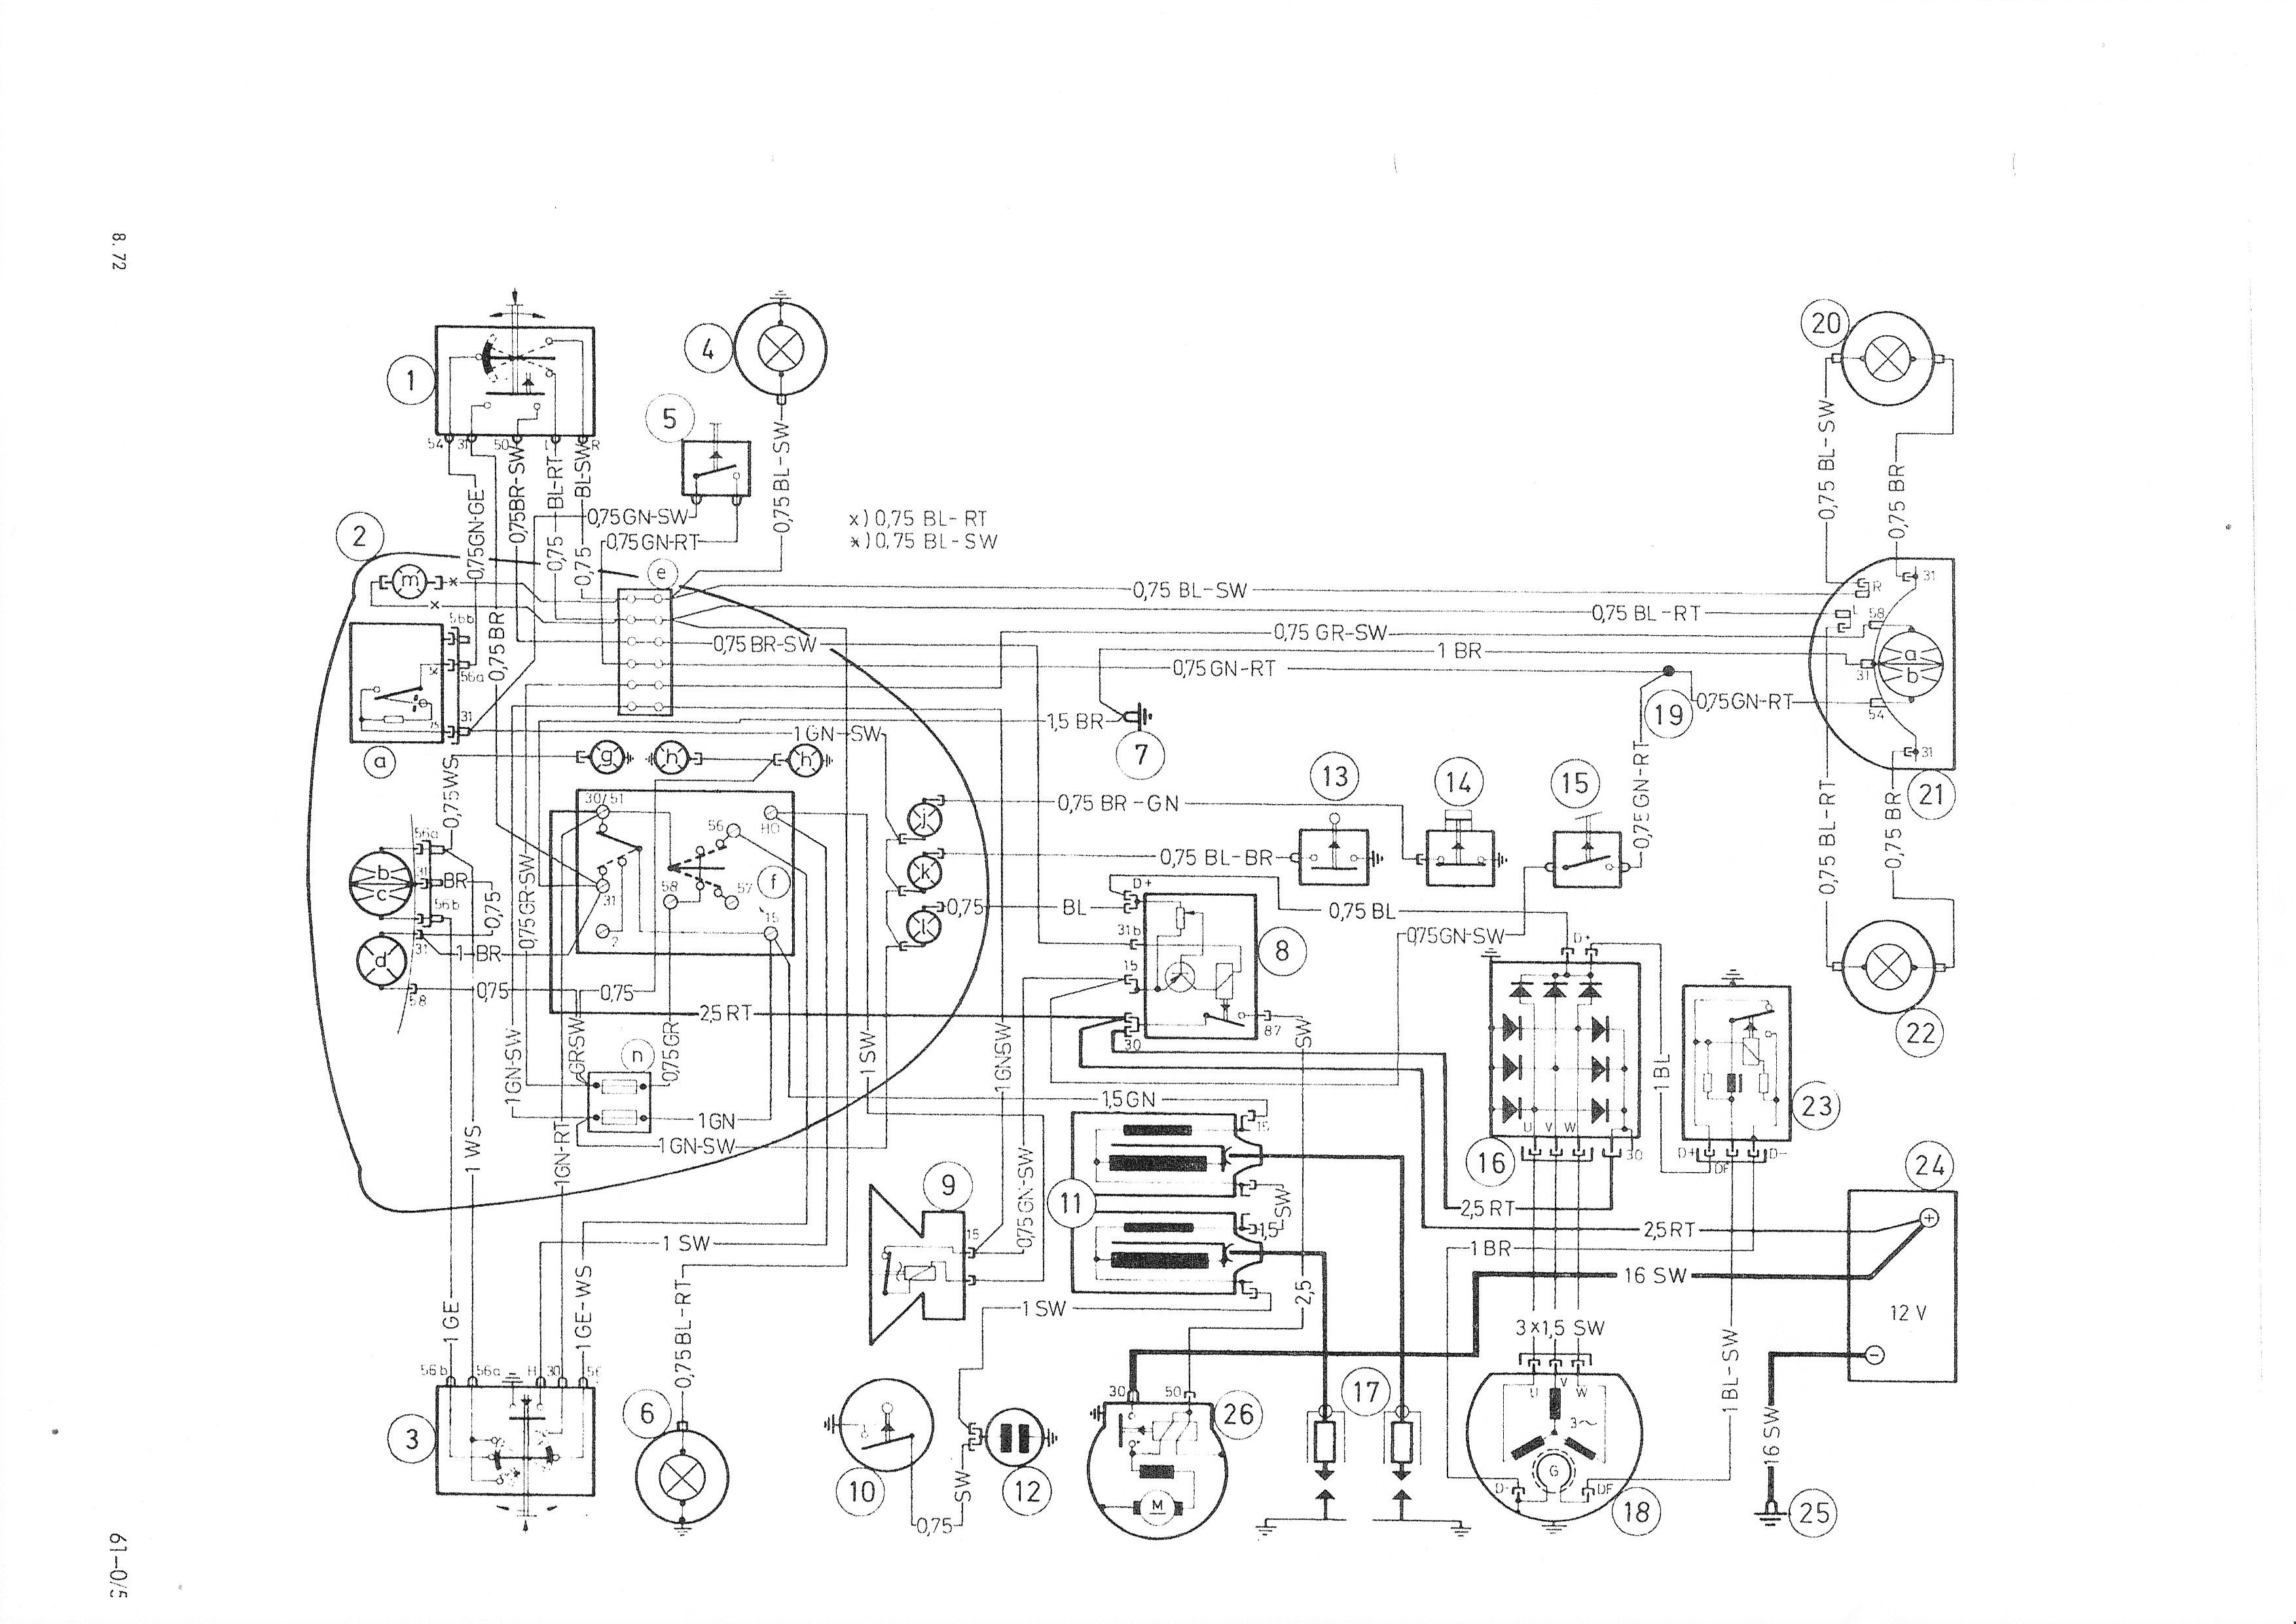 GC_3057] Bmw R25 3 Wiring Diagram Wiring Diagram | Bmw R25 2 Wiring Diagram |  | Inoma Exxlu Puti Mohammedshrine Librar Wiring 101